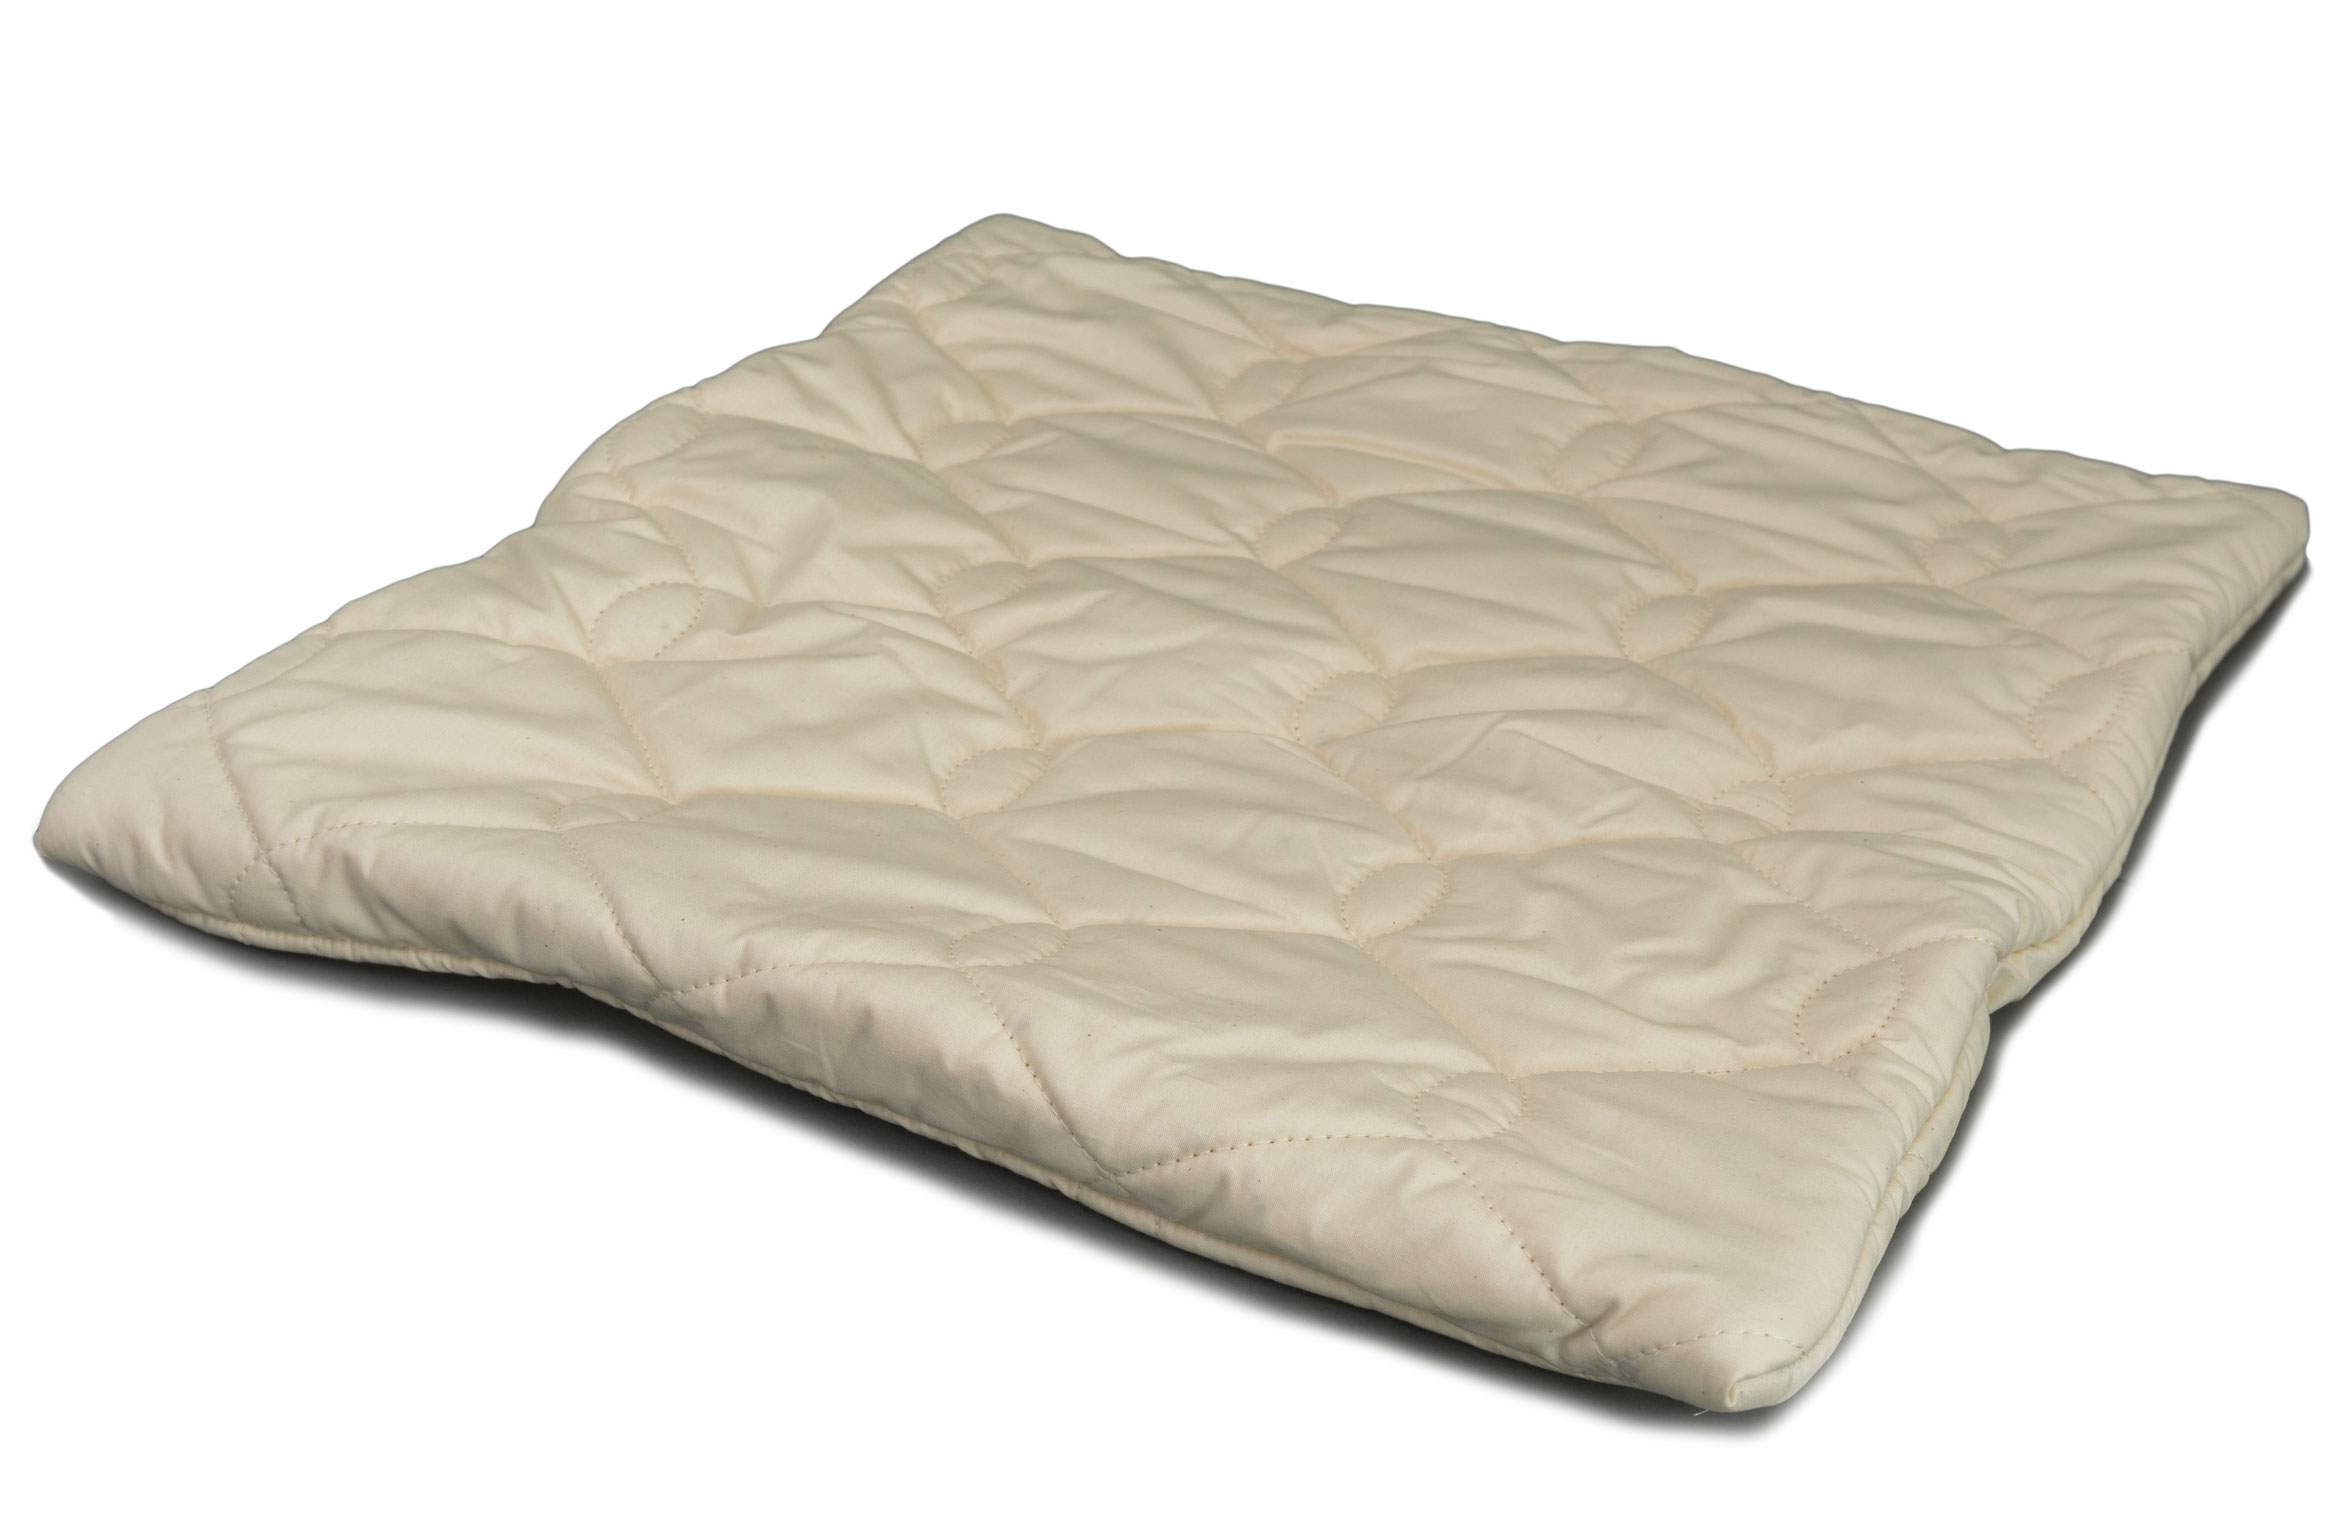 inlett 40x40cm bio steppware 3 lagig natur inletts selber f llen kissenbez ge giraffenland. Black Bedroom Furniture Sets. Home Design Ideas